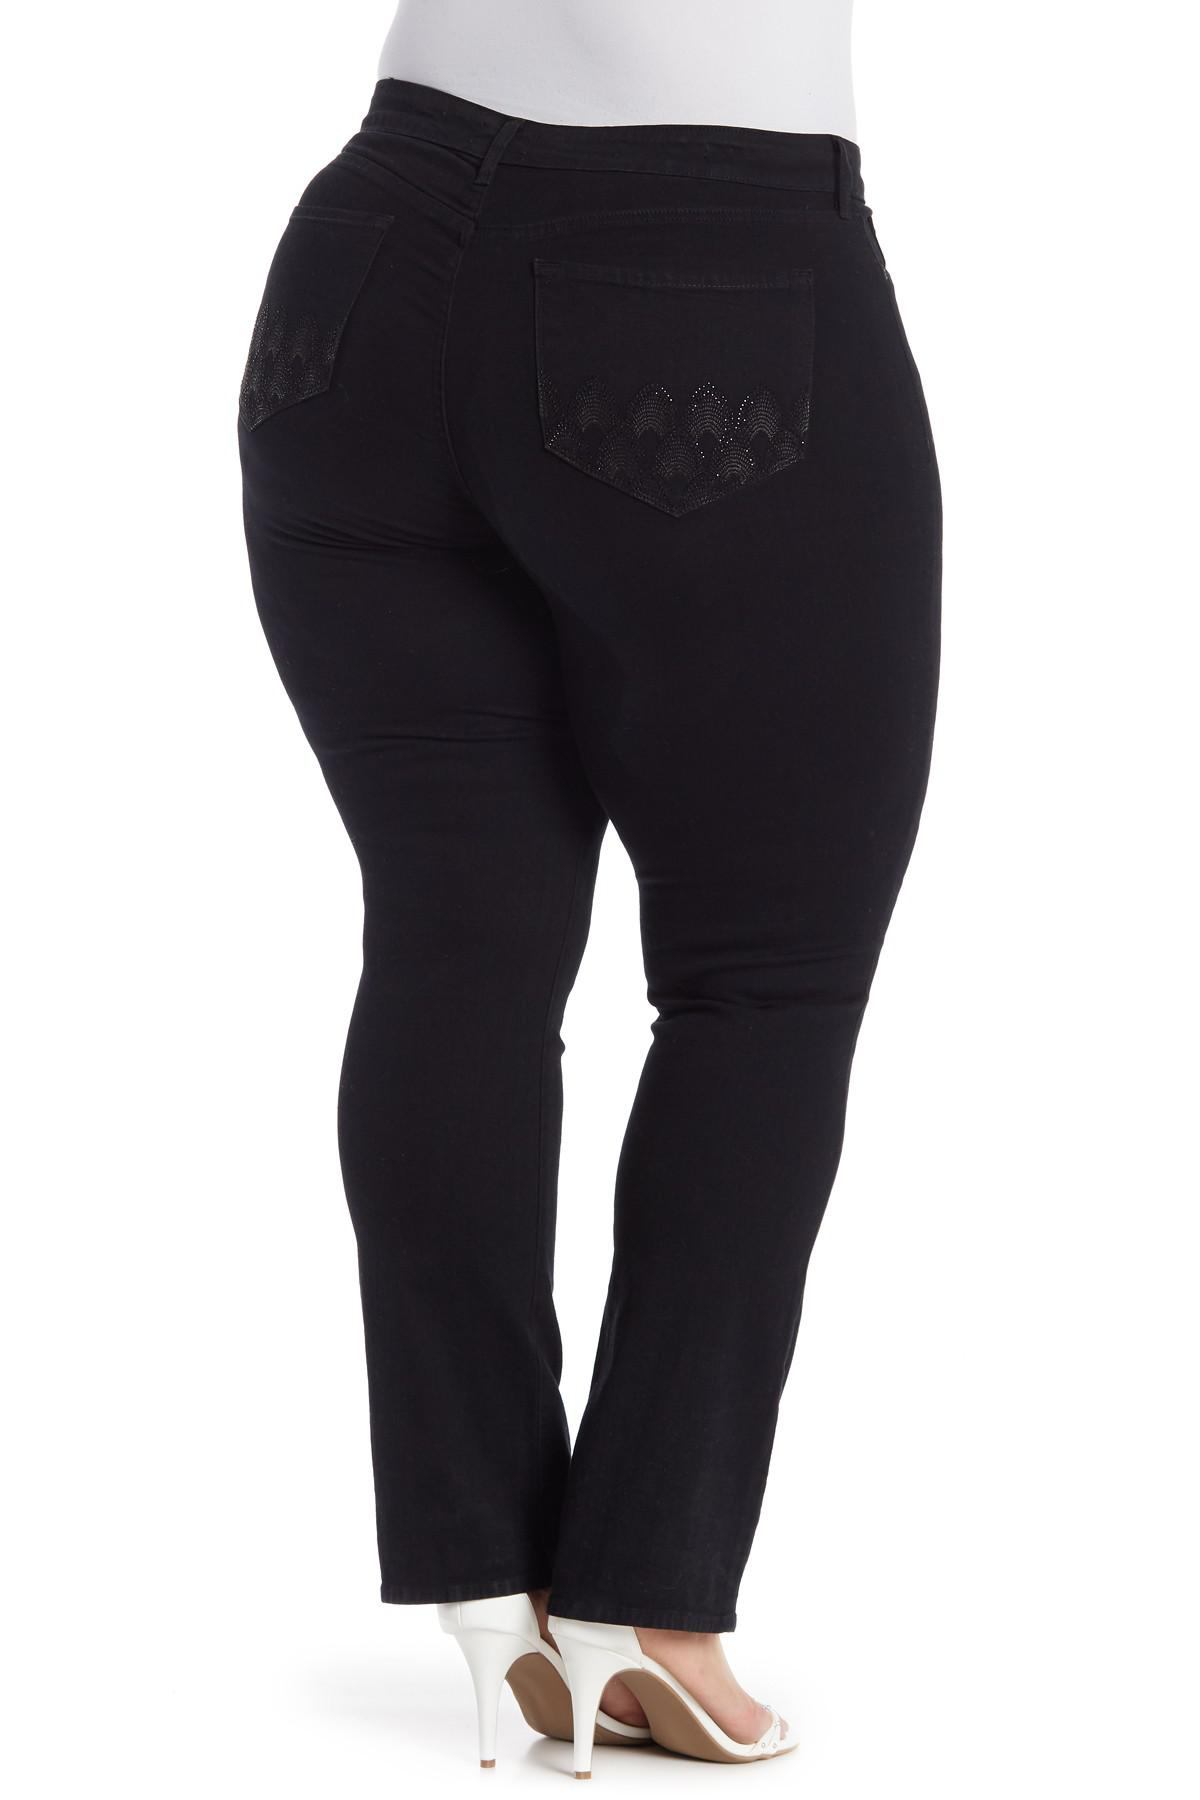 42cc22a0253 NYDJ - Black Marilyn Rhinestone Embellished Straight Leg Jeans (plus Size)  - Lyst. View fullscreen